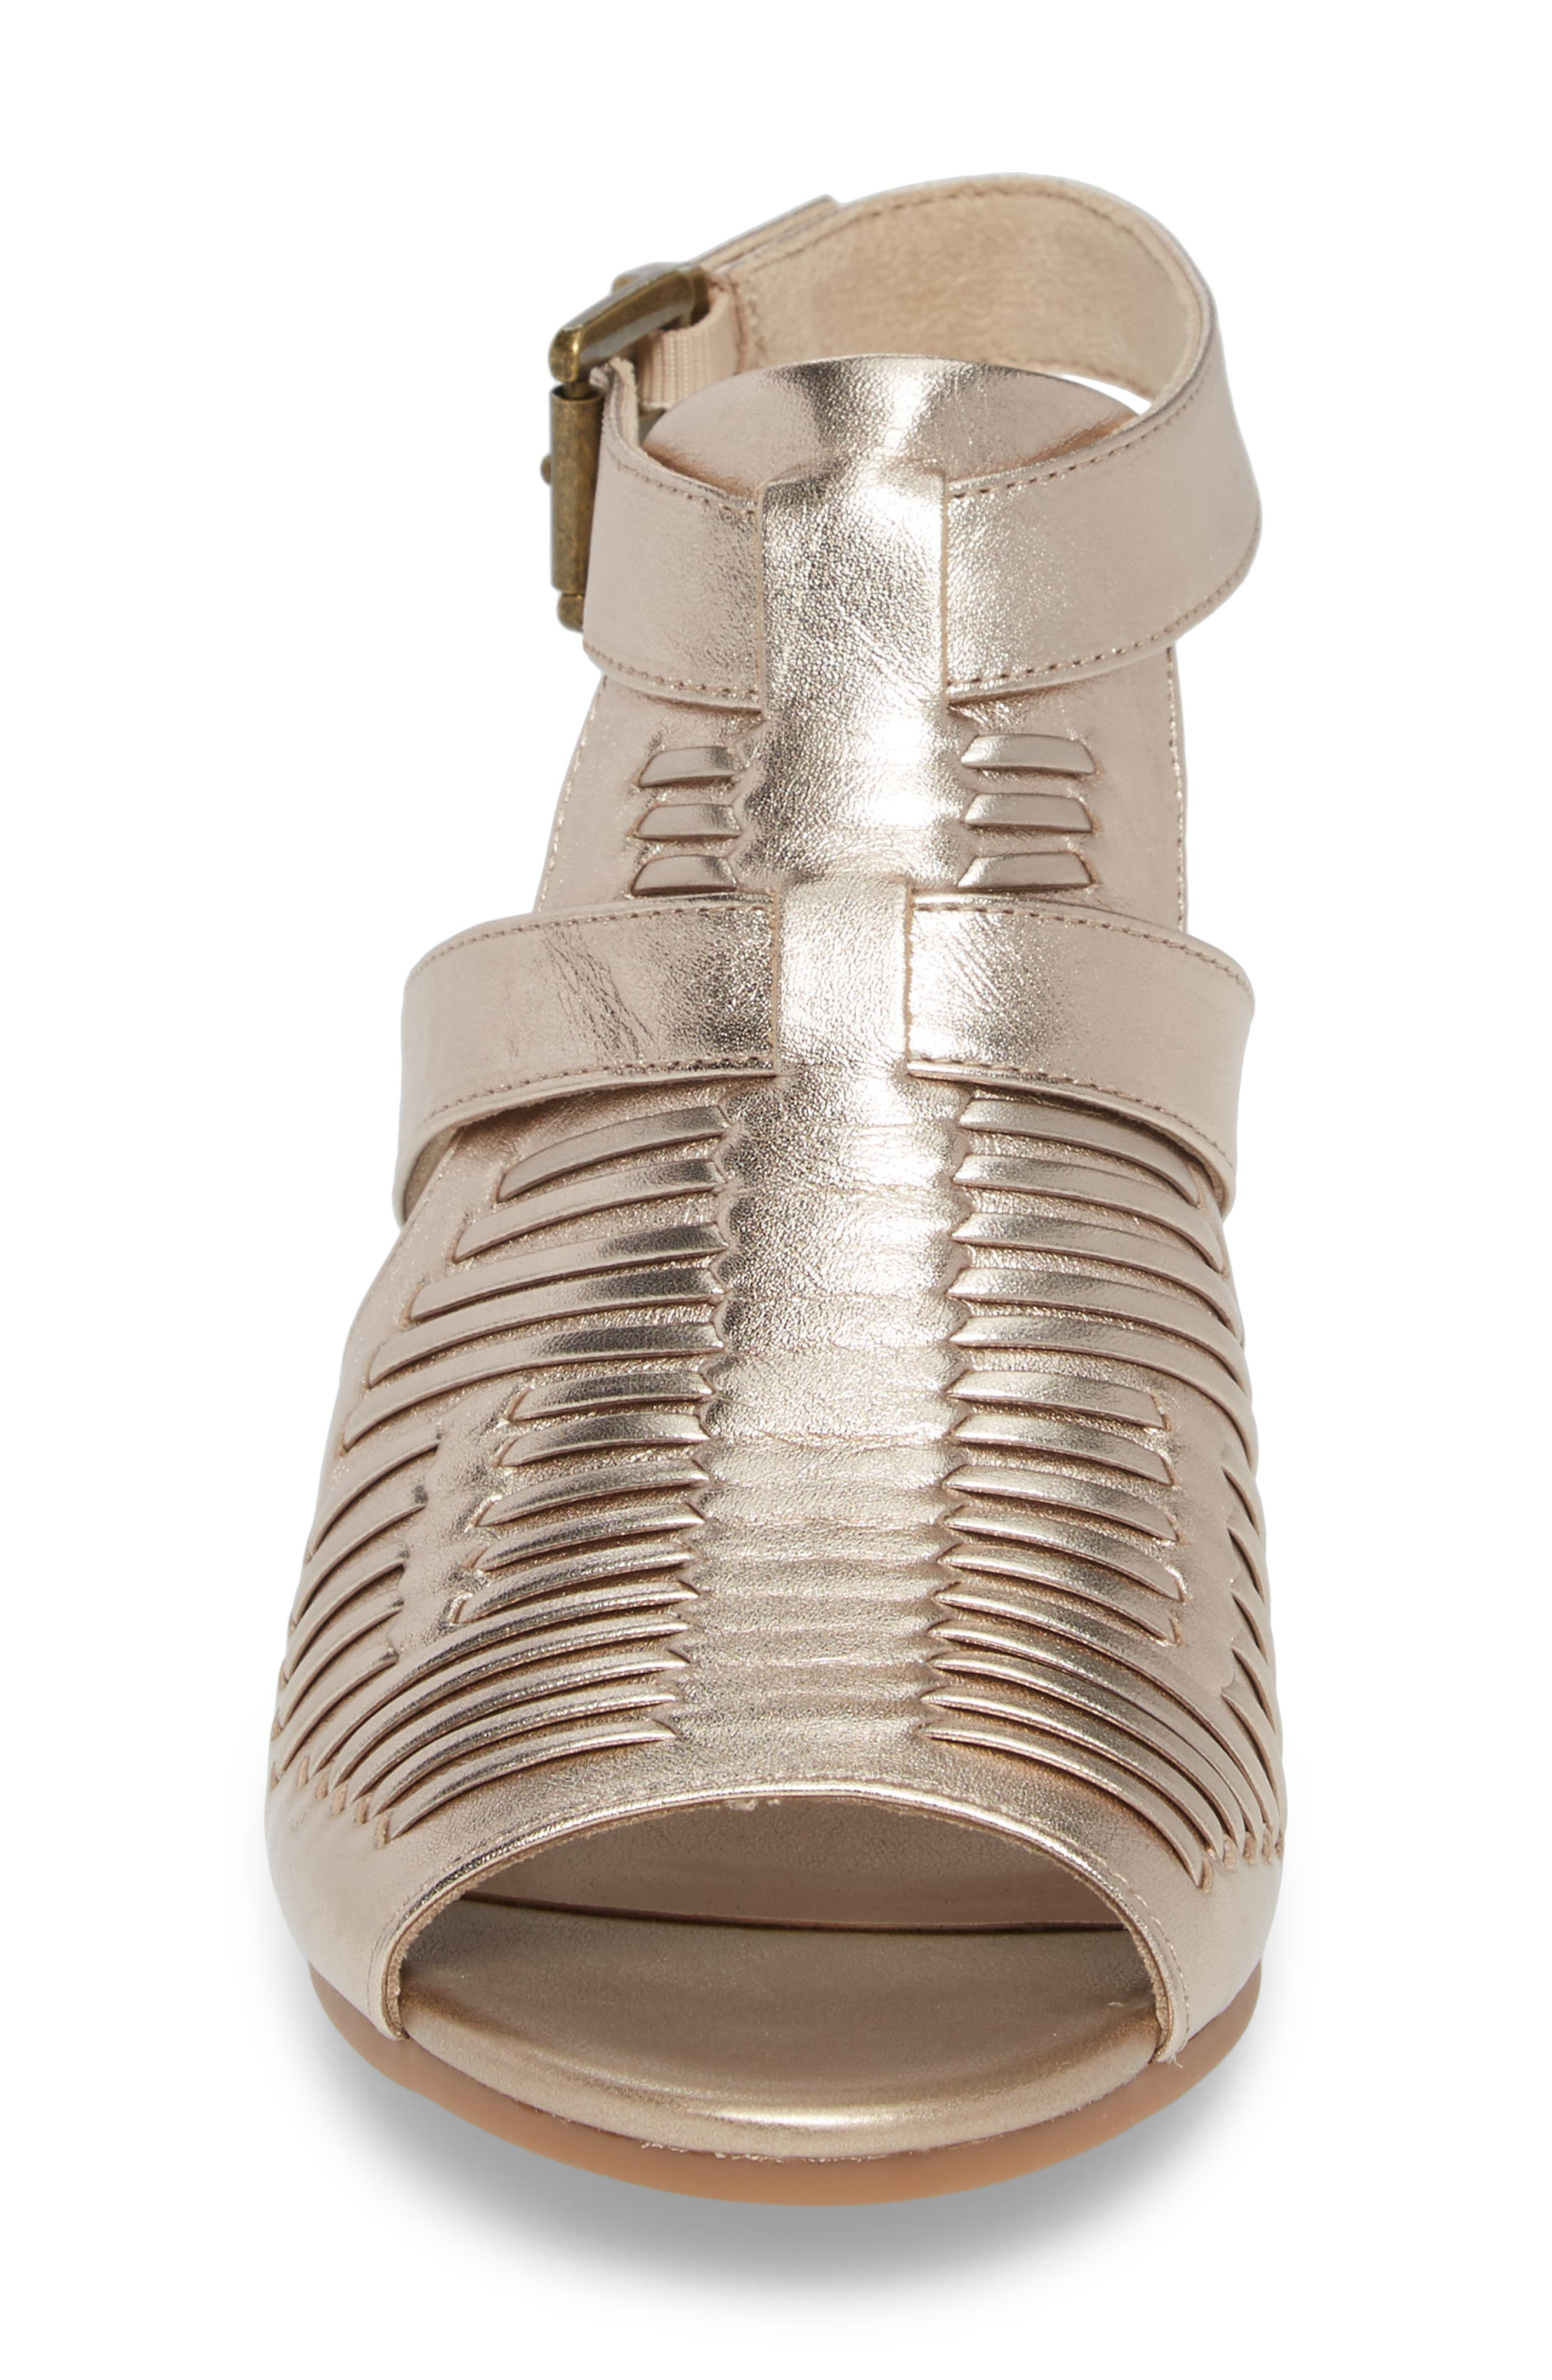 Finley Ankle Strap Sandal,                             Alternate thumbnail 18, color,